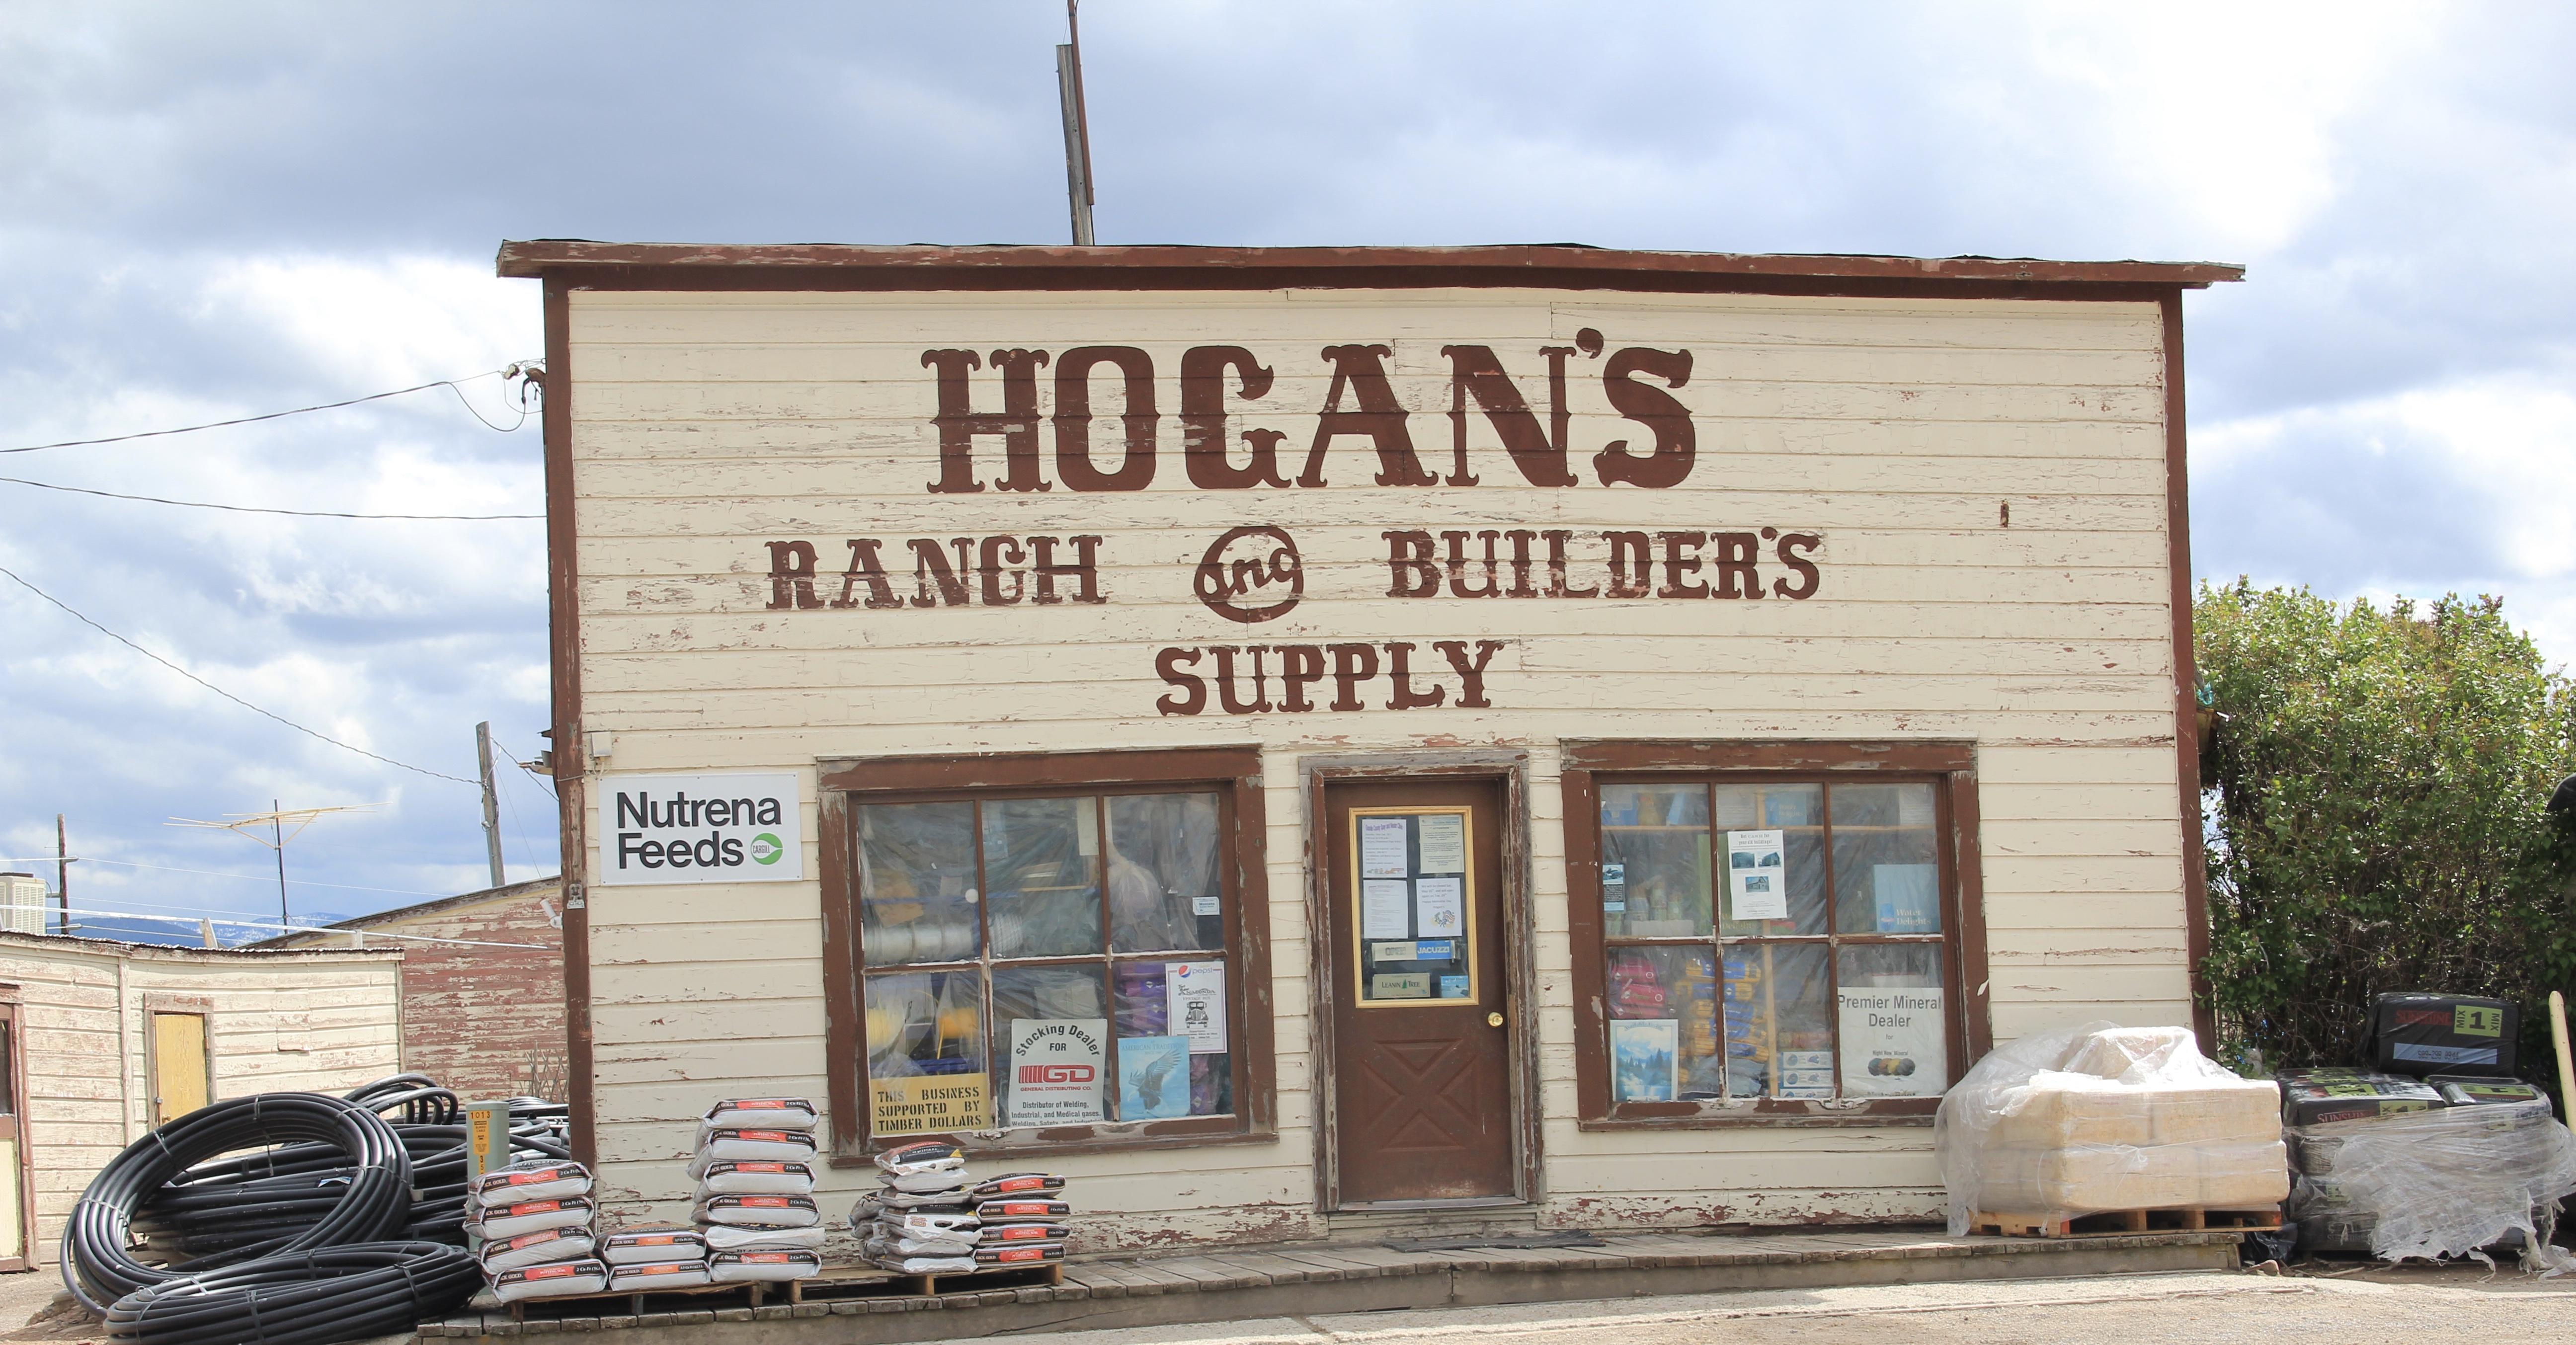 Hogan's store, MT 512, Hall